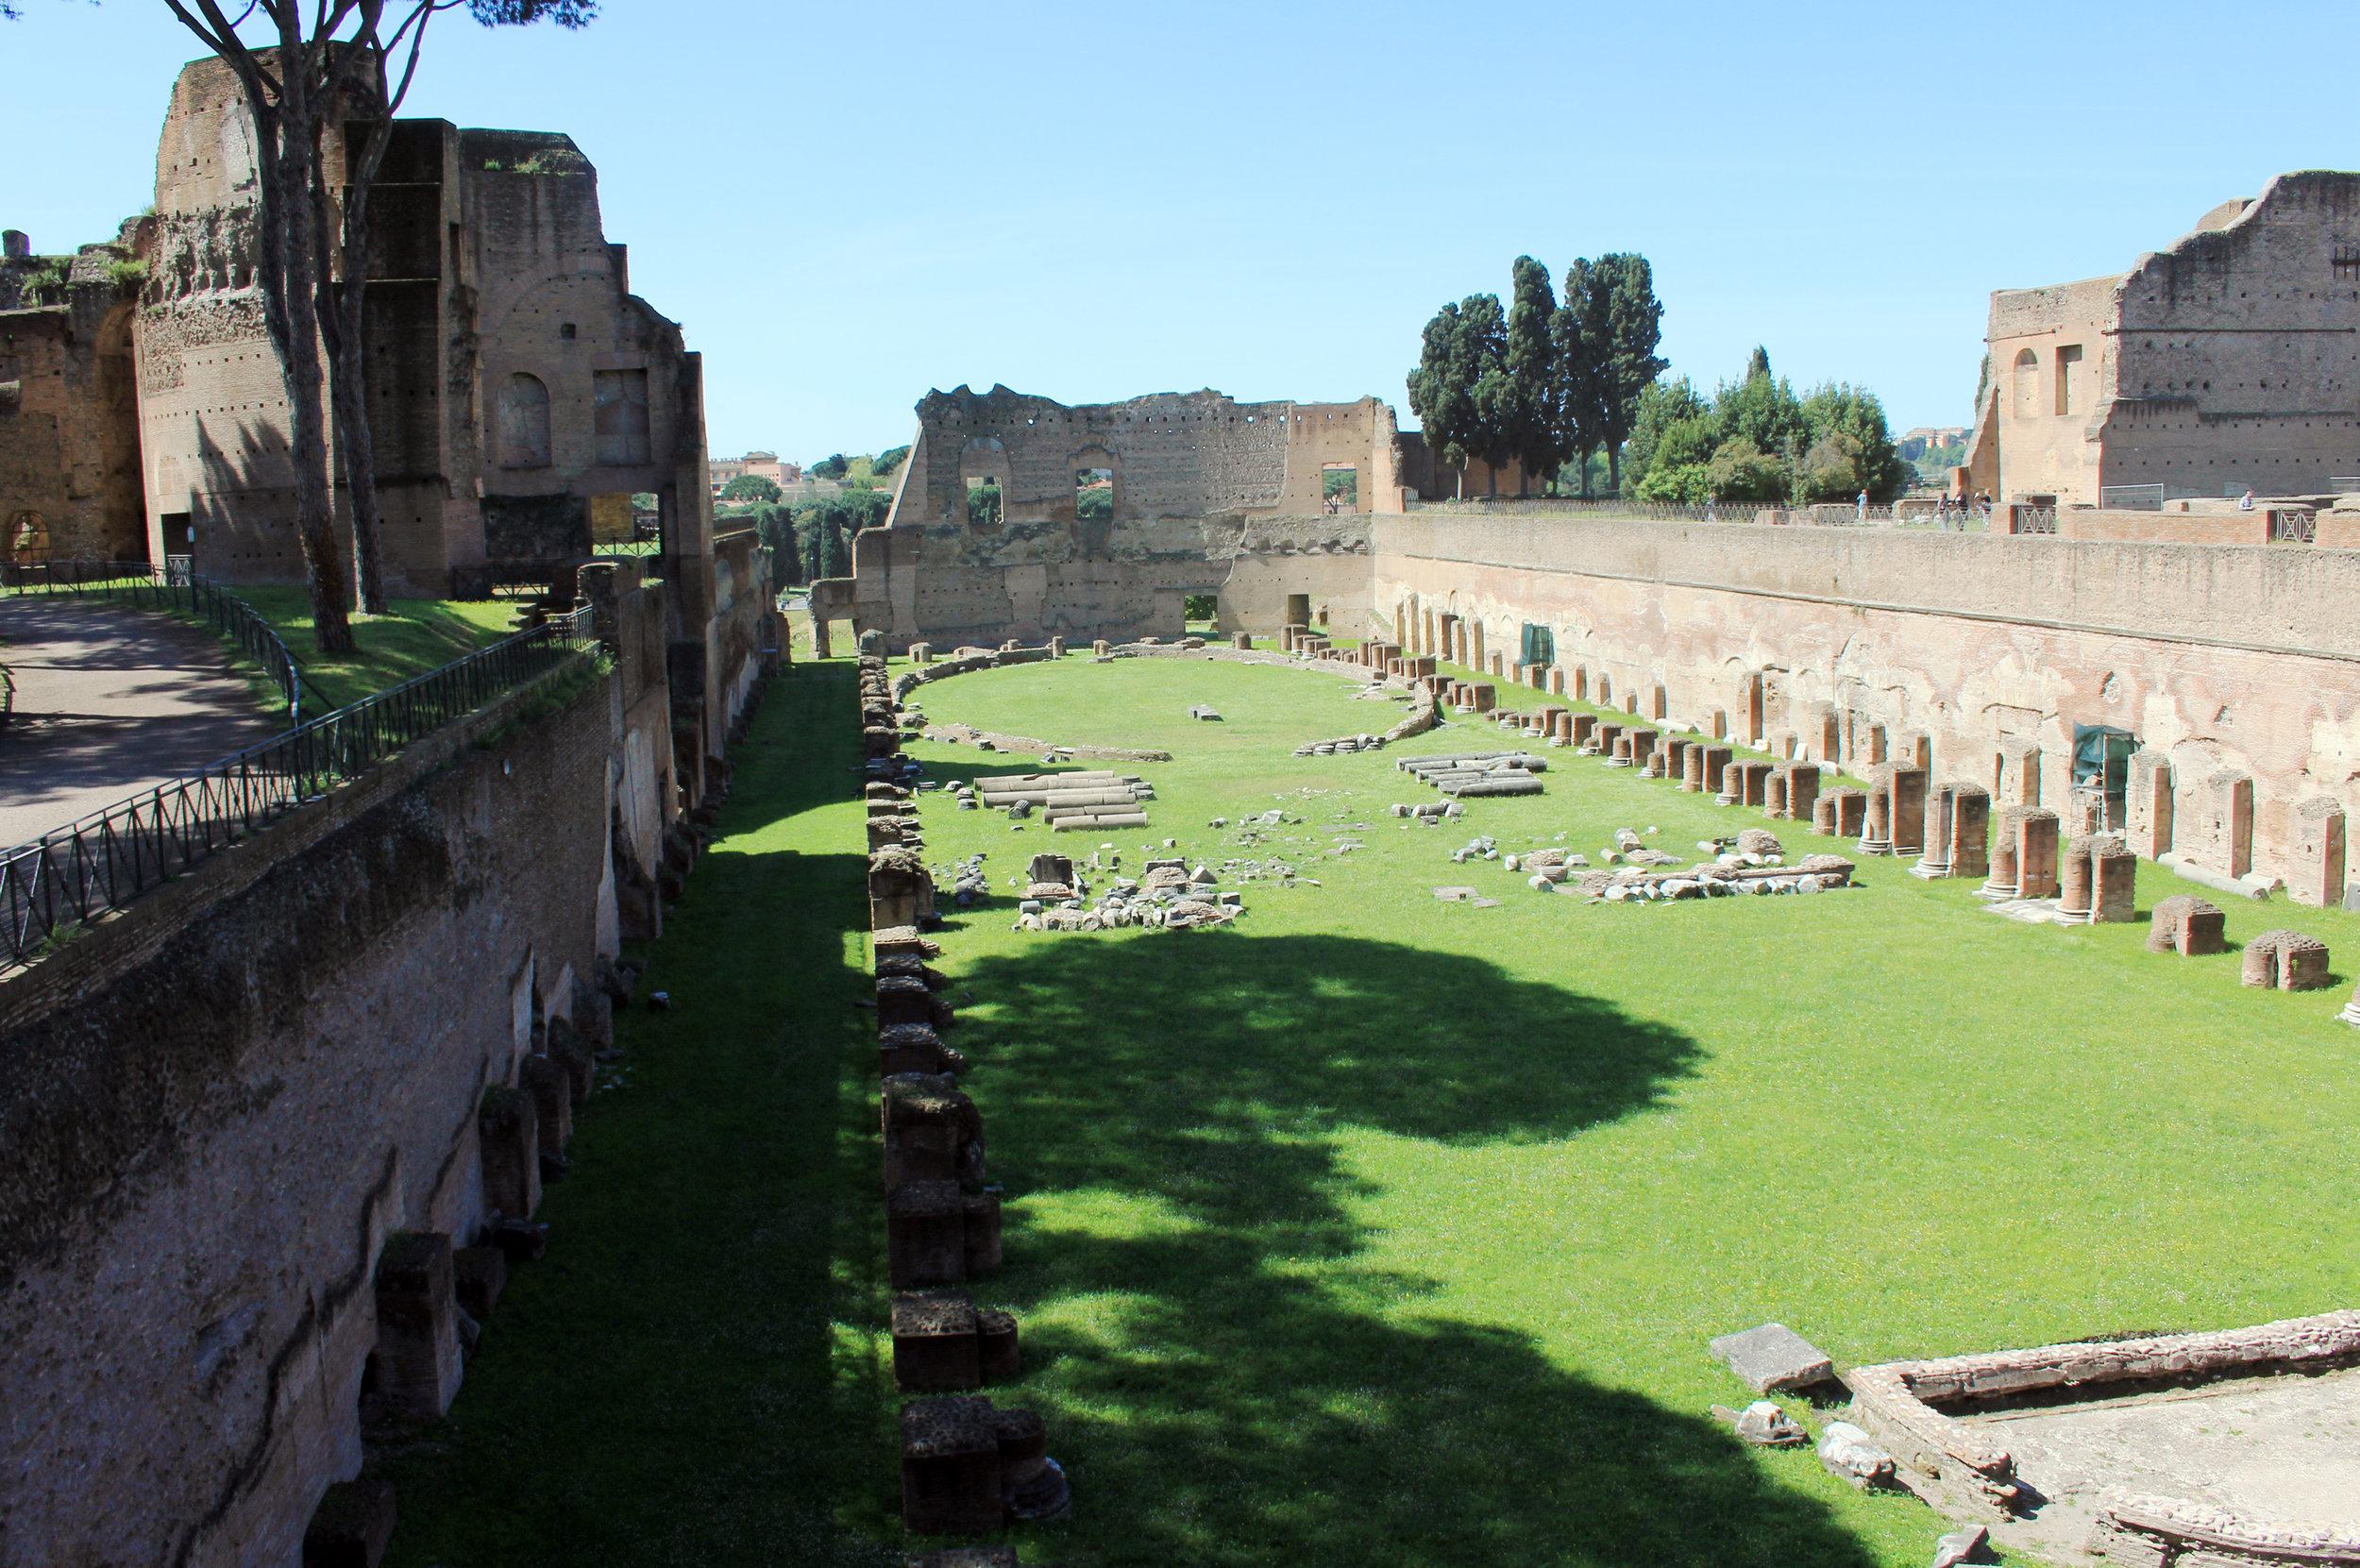 The Palatine Hill, Rome, Italy